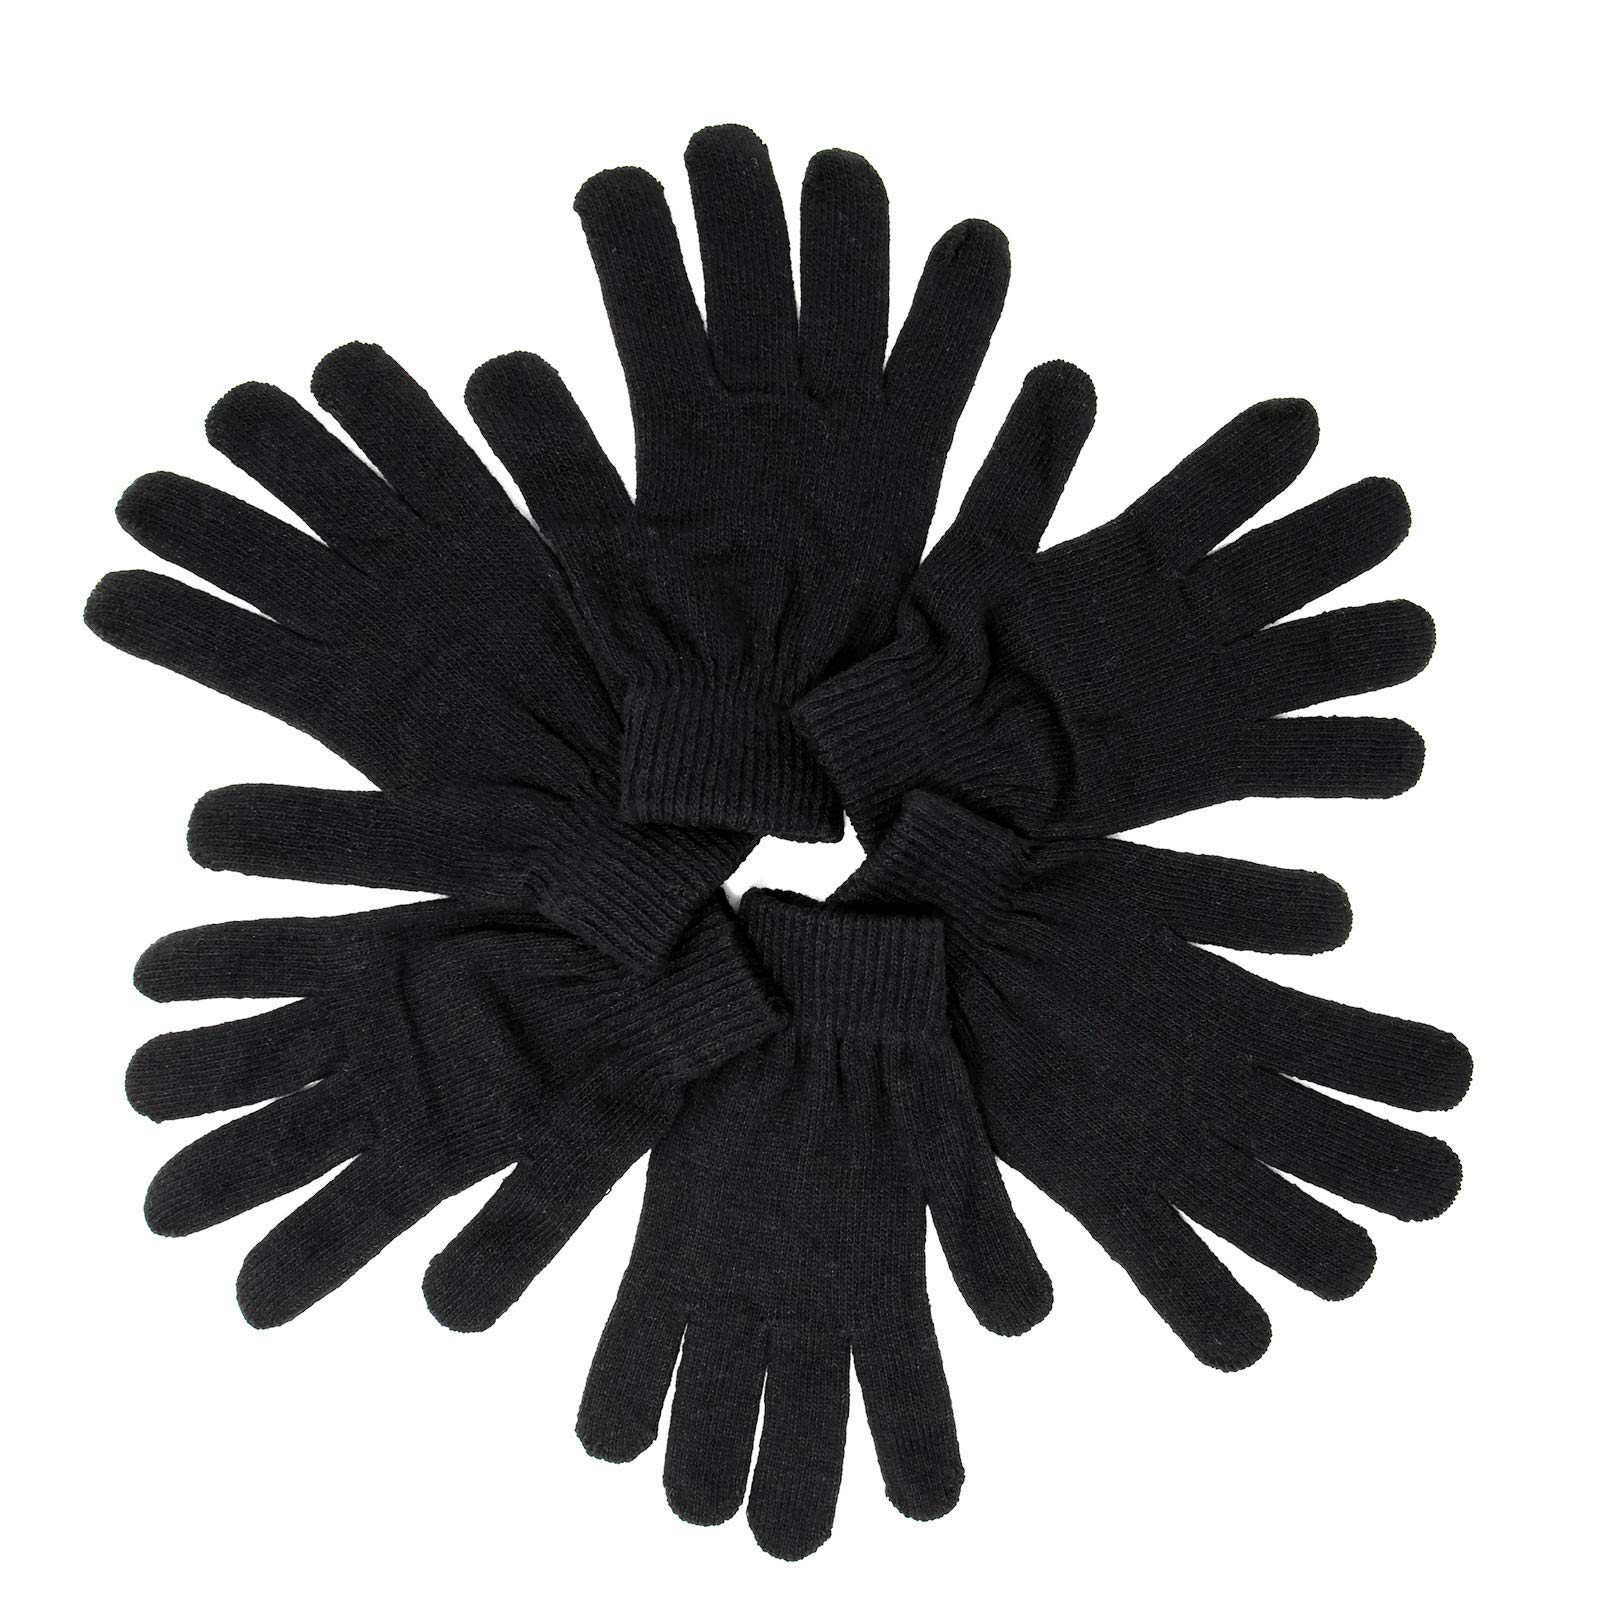 Wholesale Adult Kids Magic Winter Knit Gloves 12 Pair (Black)